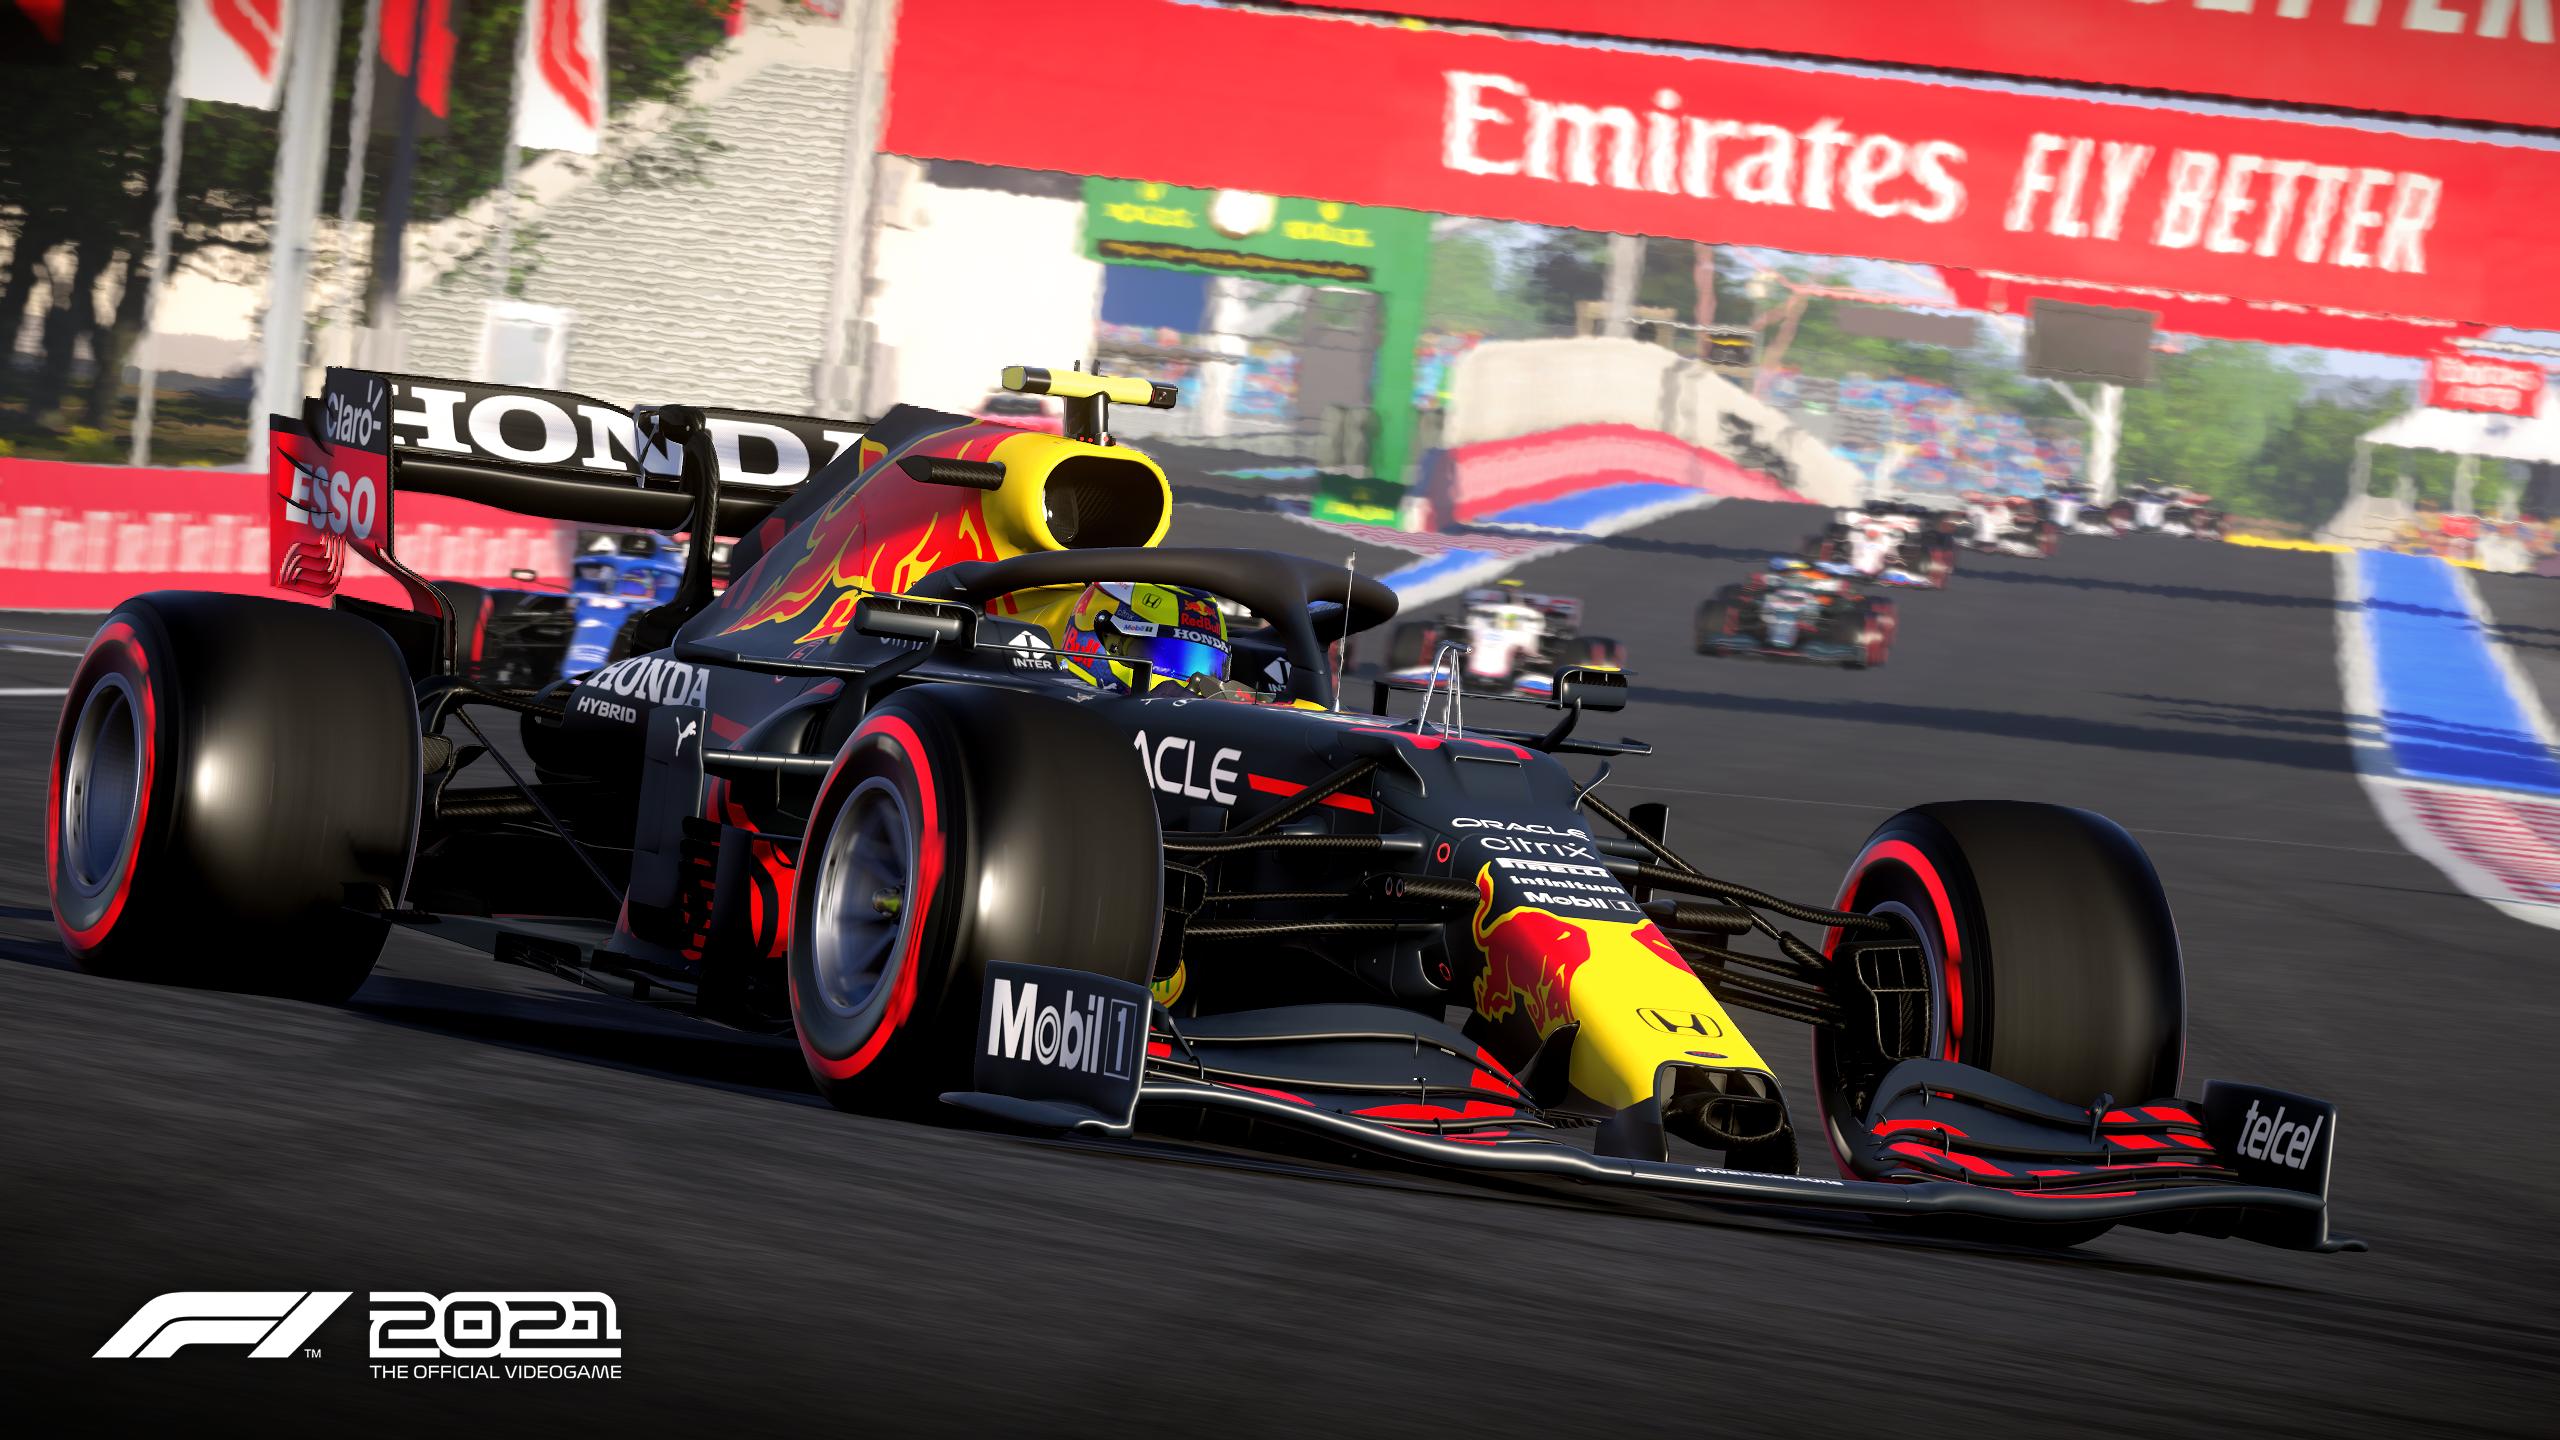 F1 2021 Features Trailer toont nieuwe carrièremodus